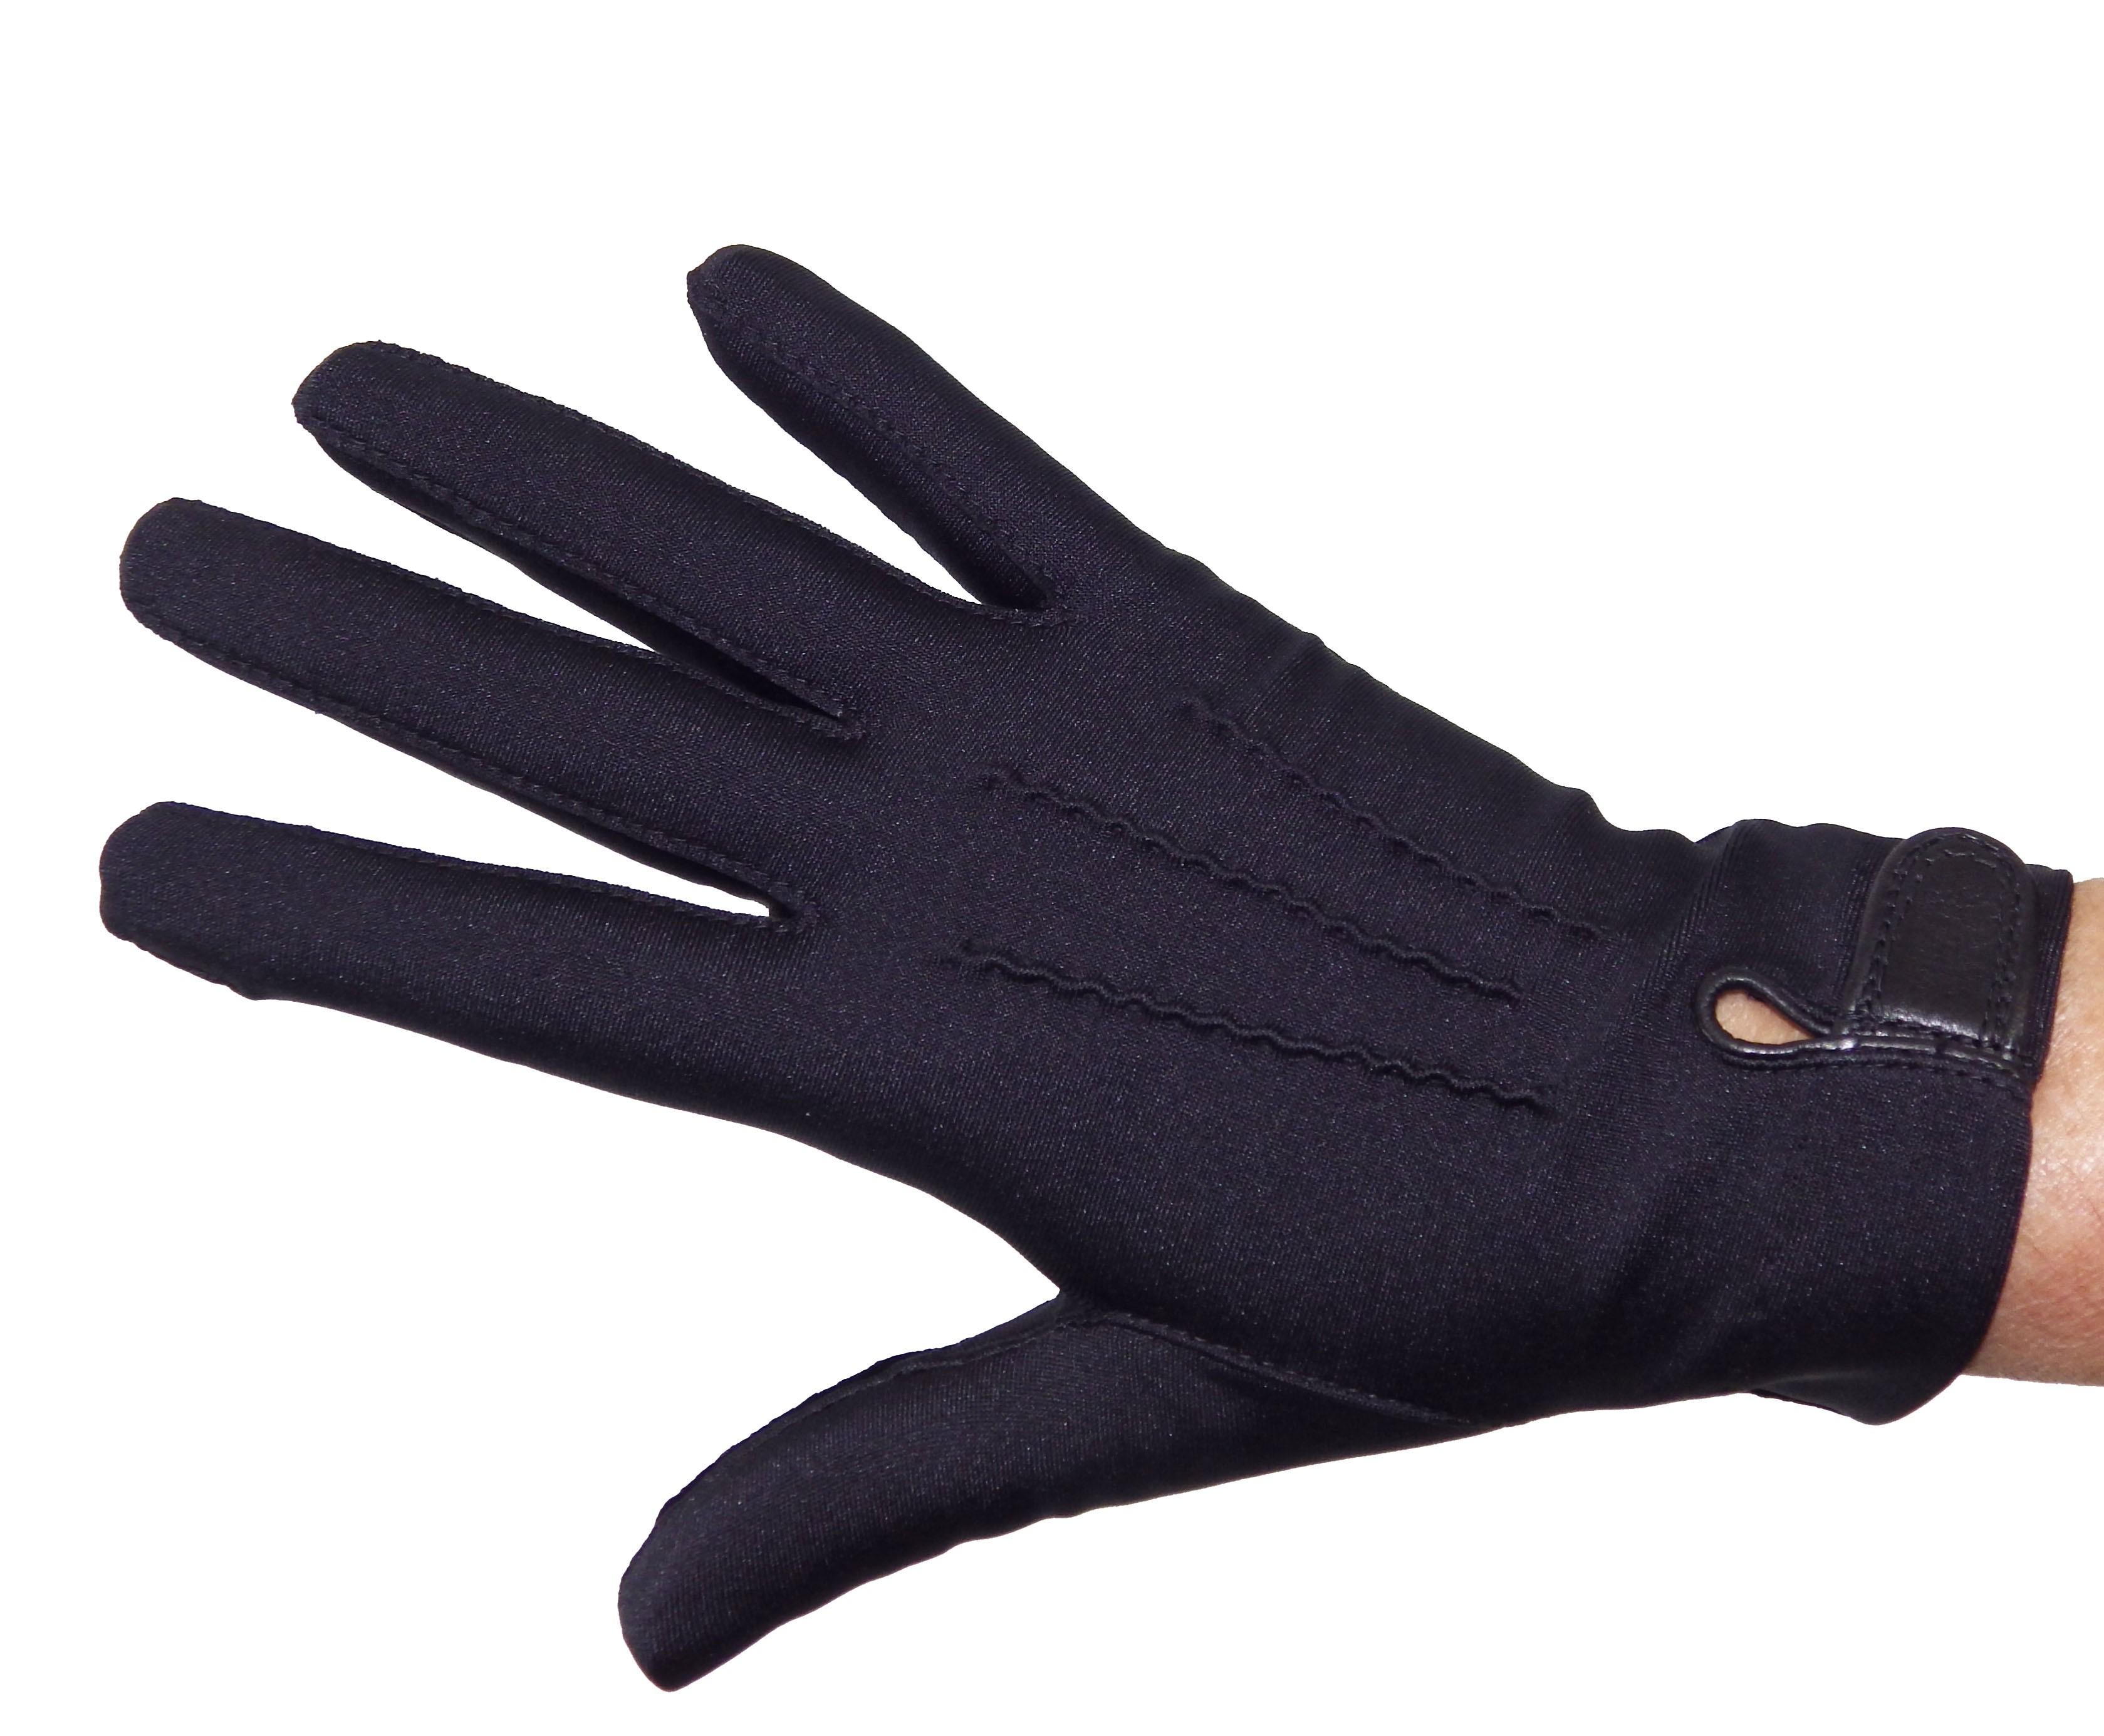 cdfcd9521257 Dessus Dame Glove Gant 3 Tissu Unique Story Baguette Taille 11022nf CwZqFU